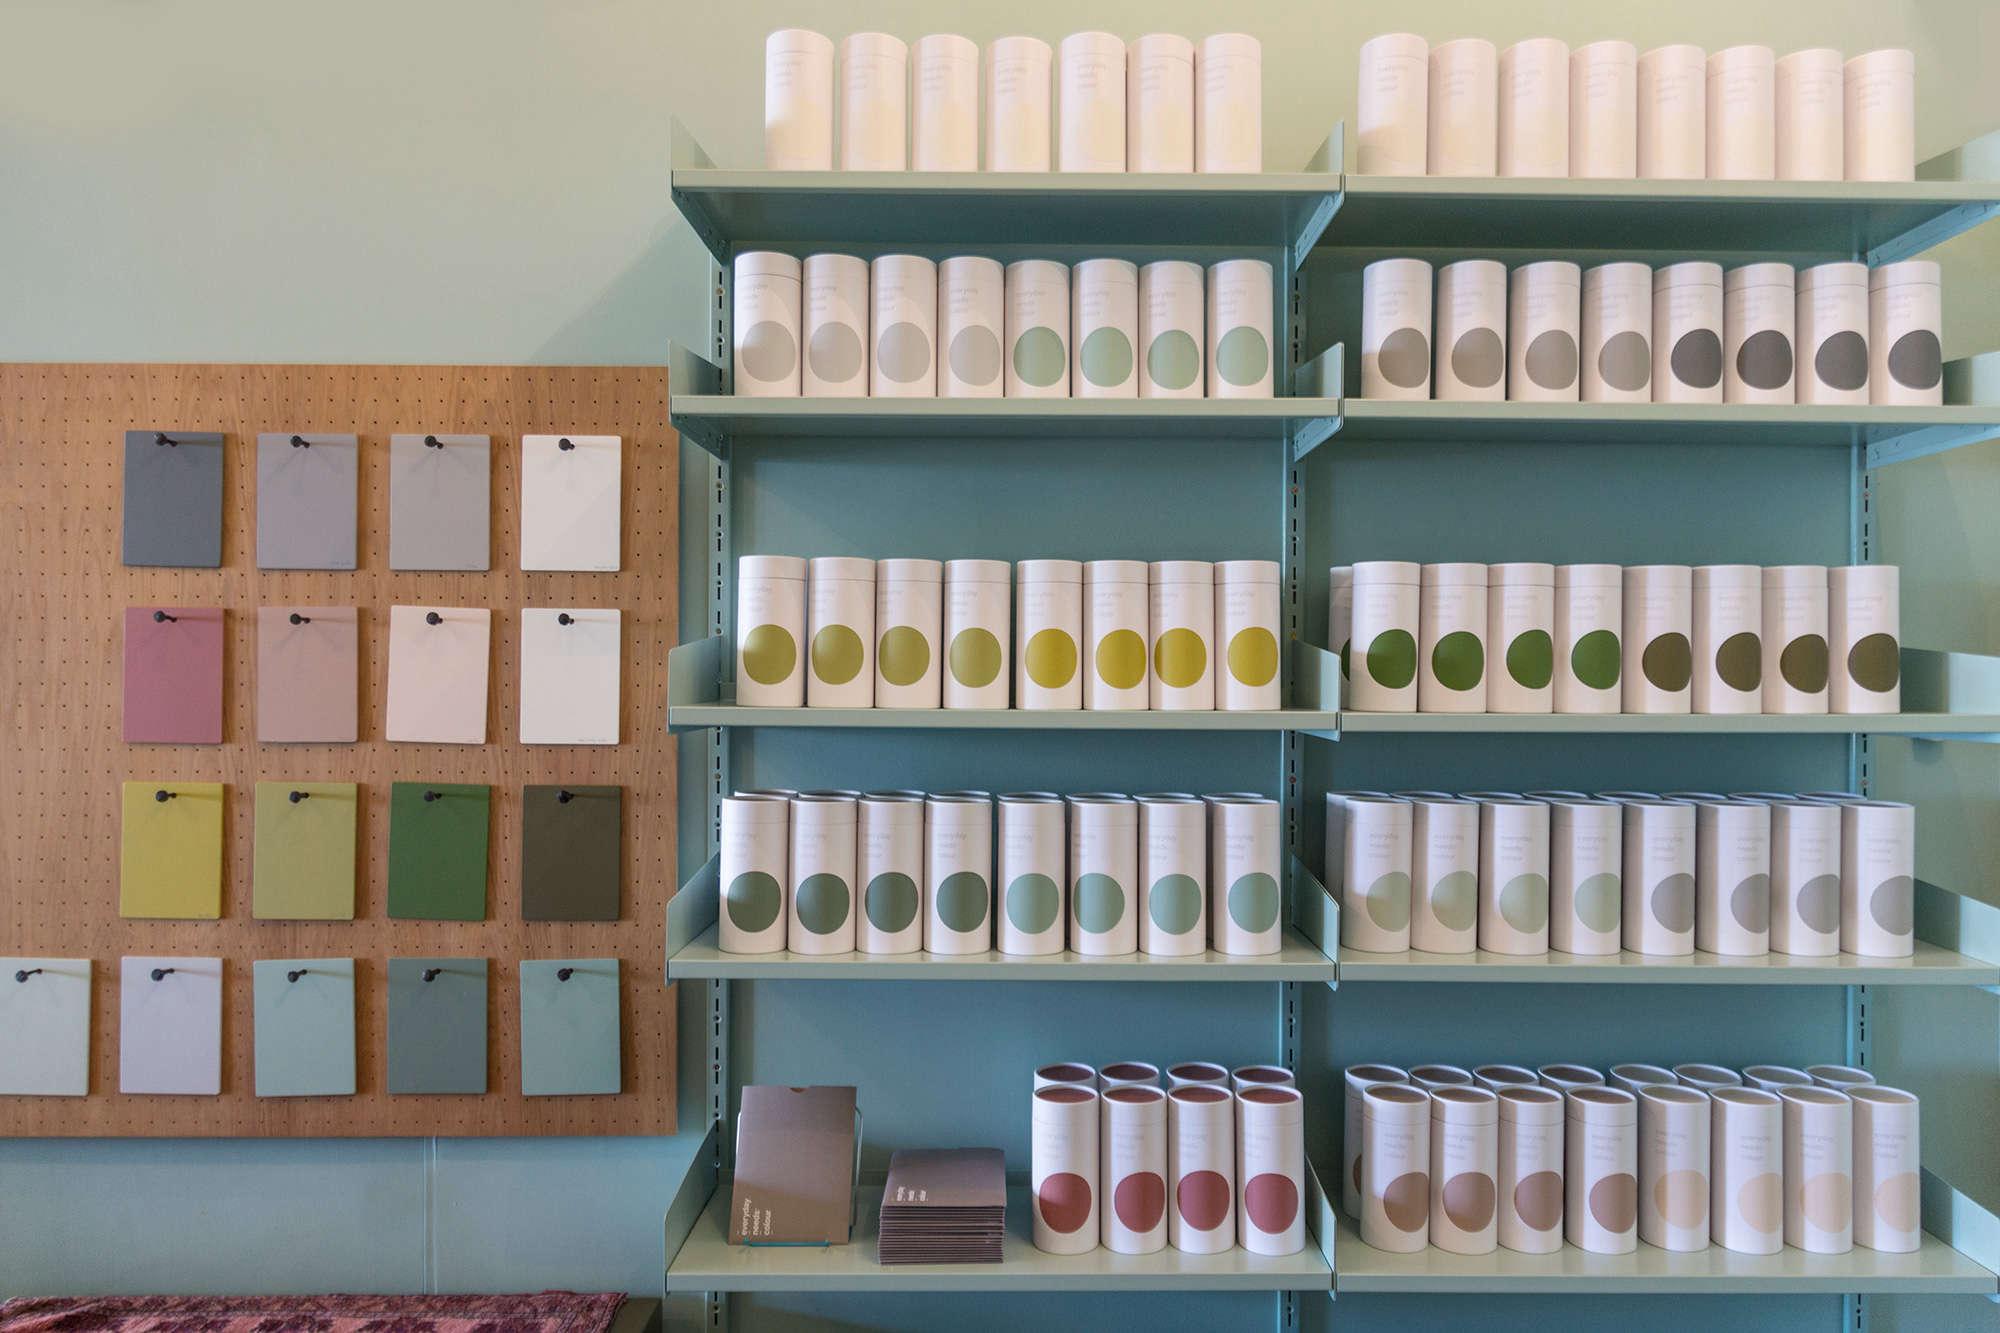 shop-green-paint-display-everyday-needs